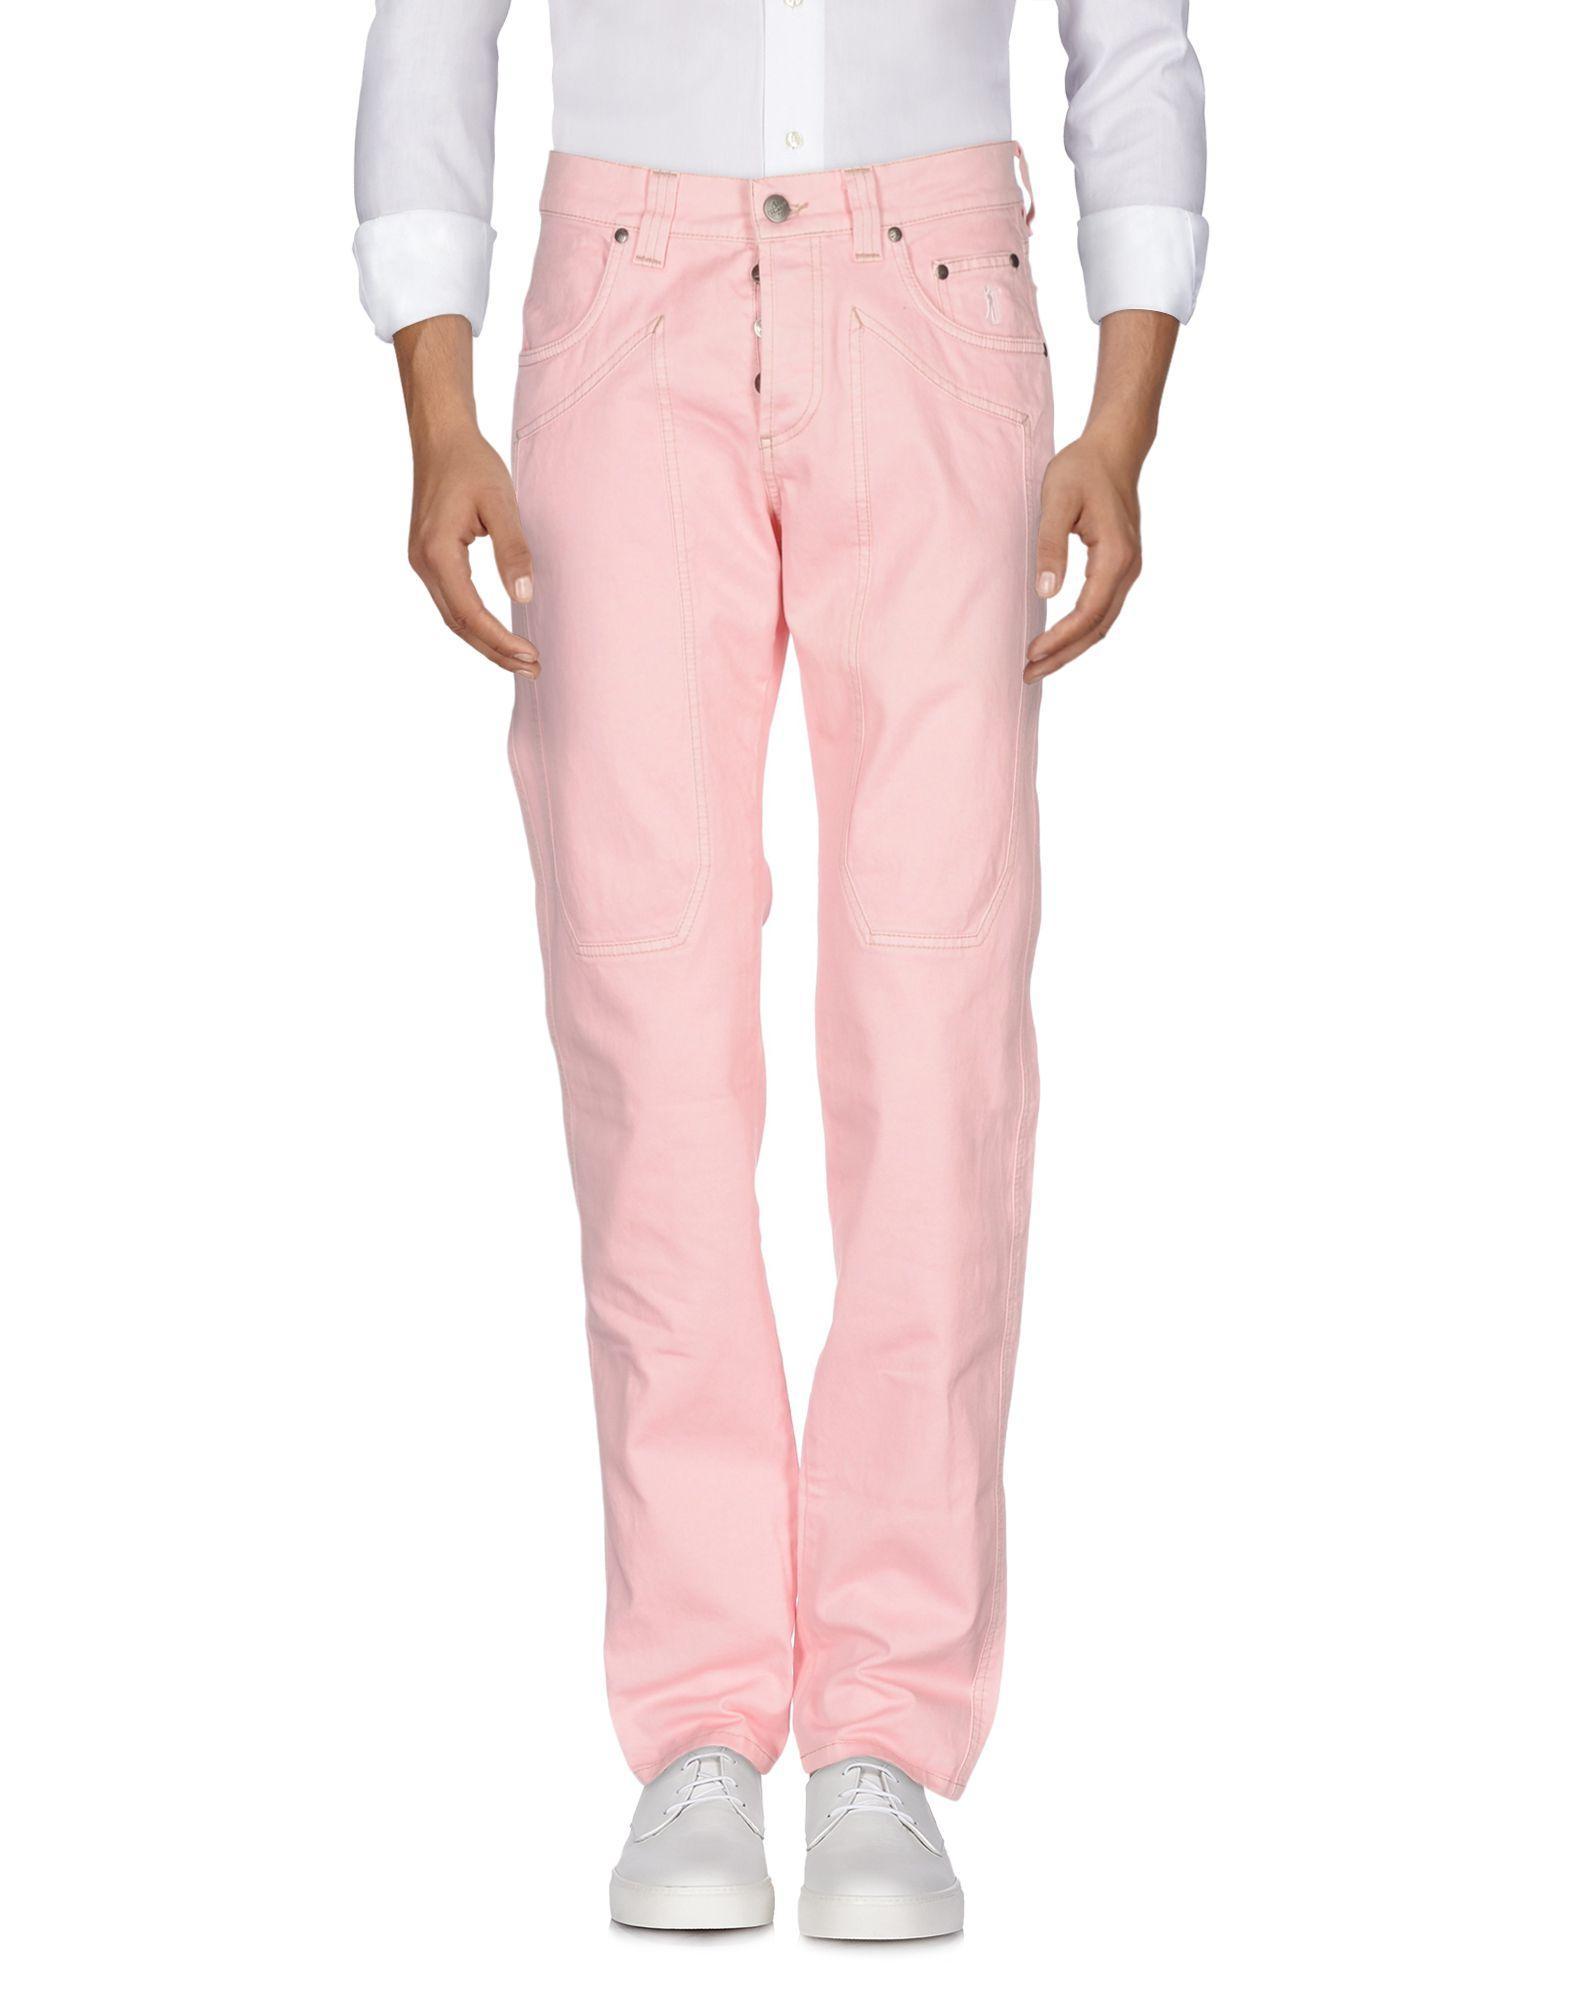 Jeckerson Denim Pants In Pink